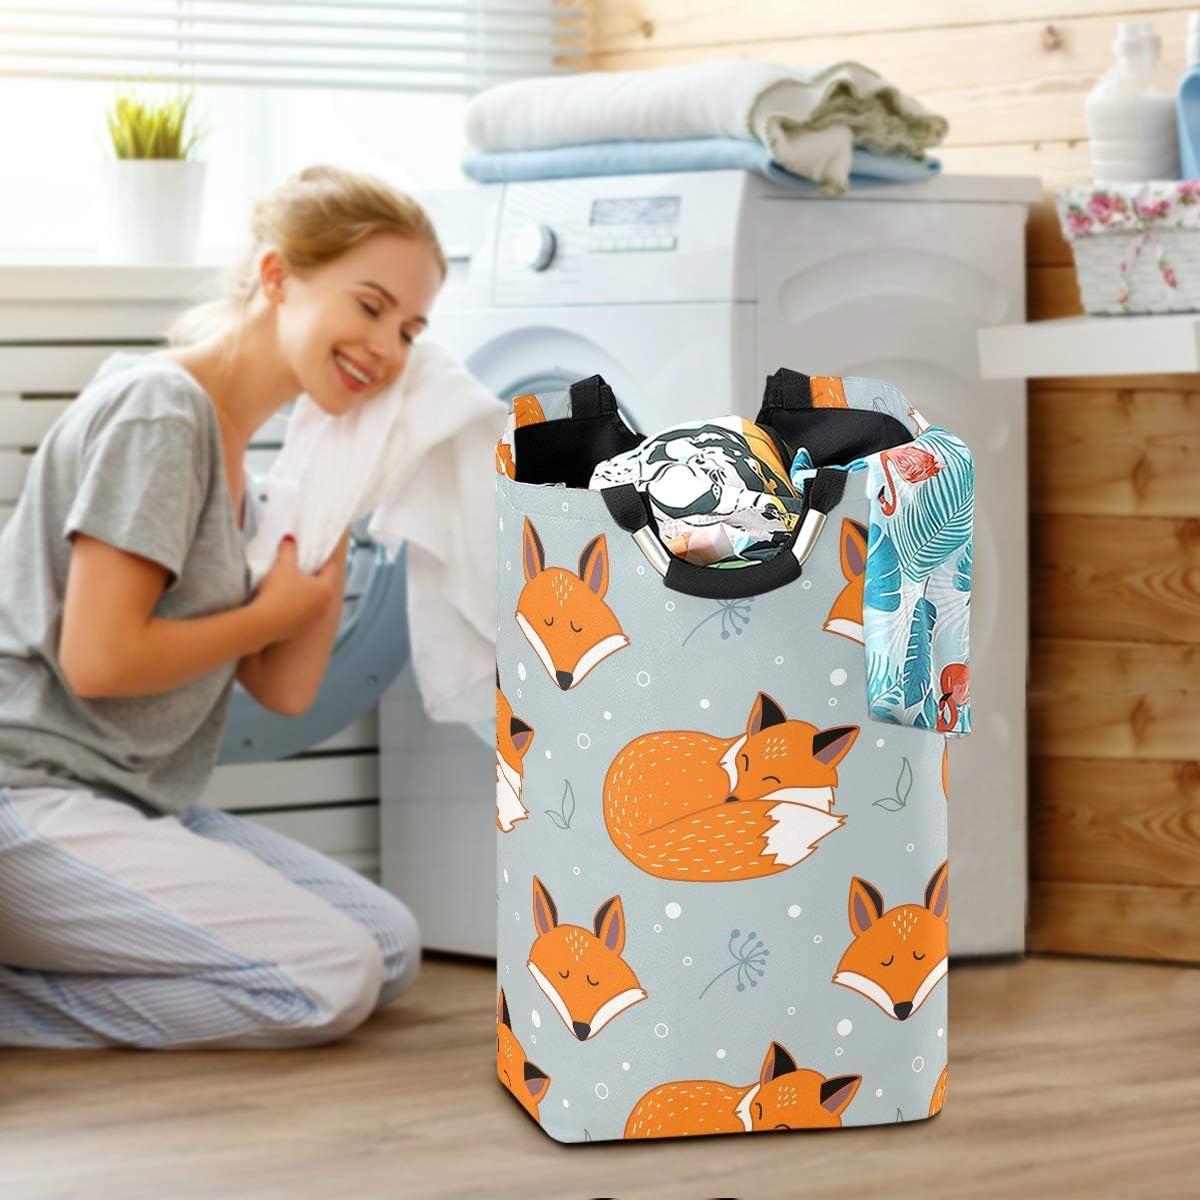 Unimagic Collapsible Laundry Basket Cute Sleeping Fox Laundry Hamper Large Cloth Hamper Laundry Organizer Holder with Handle